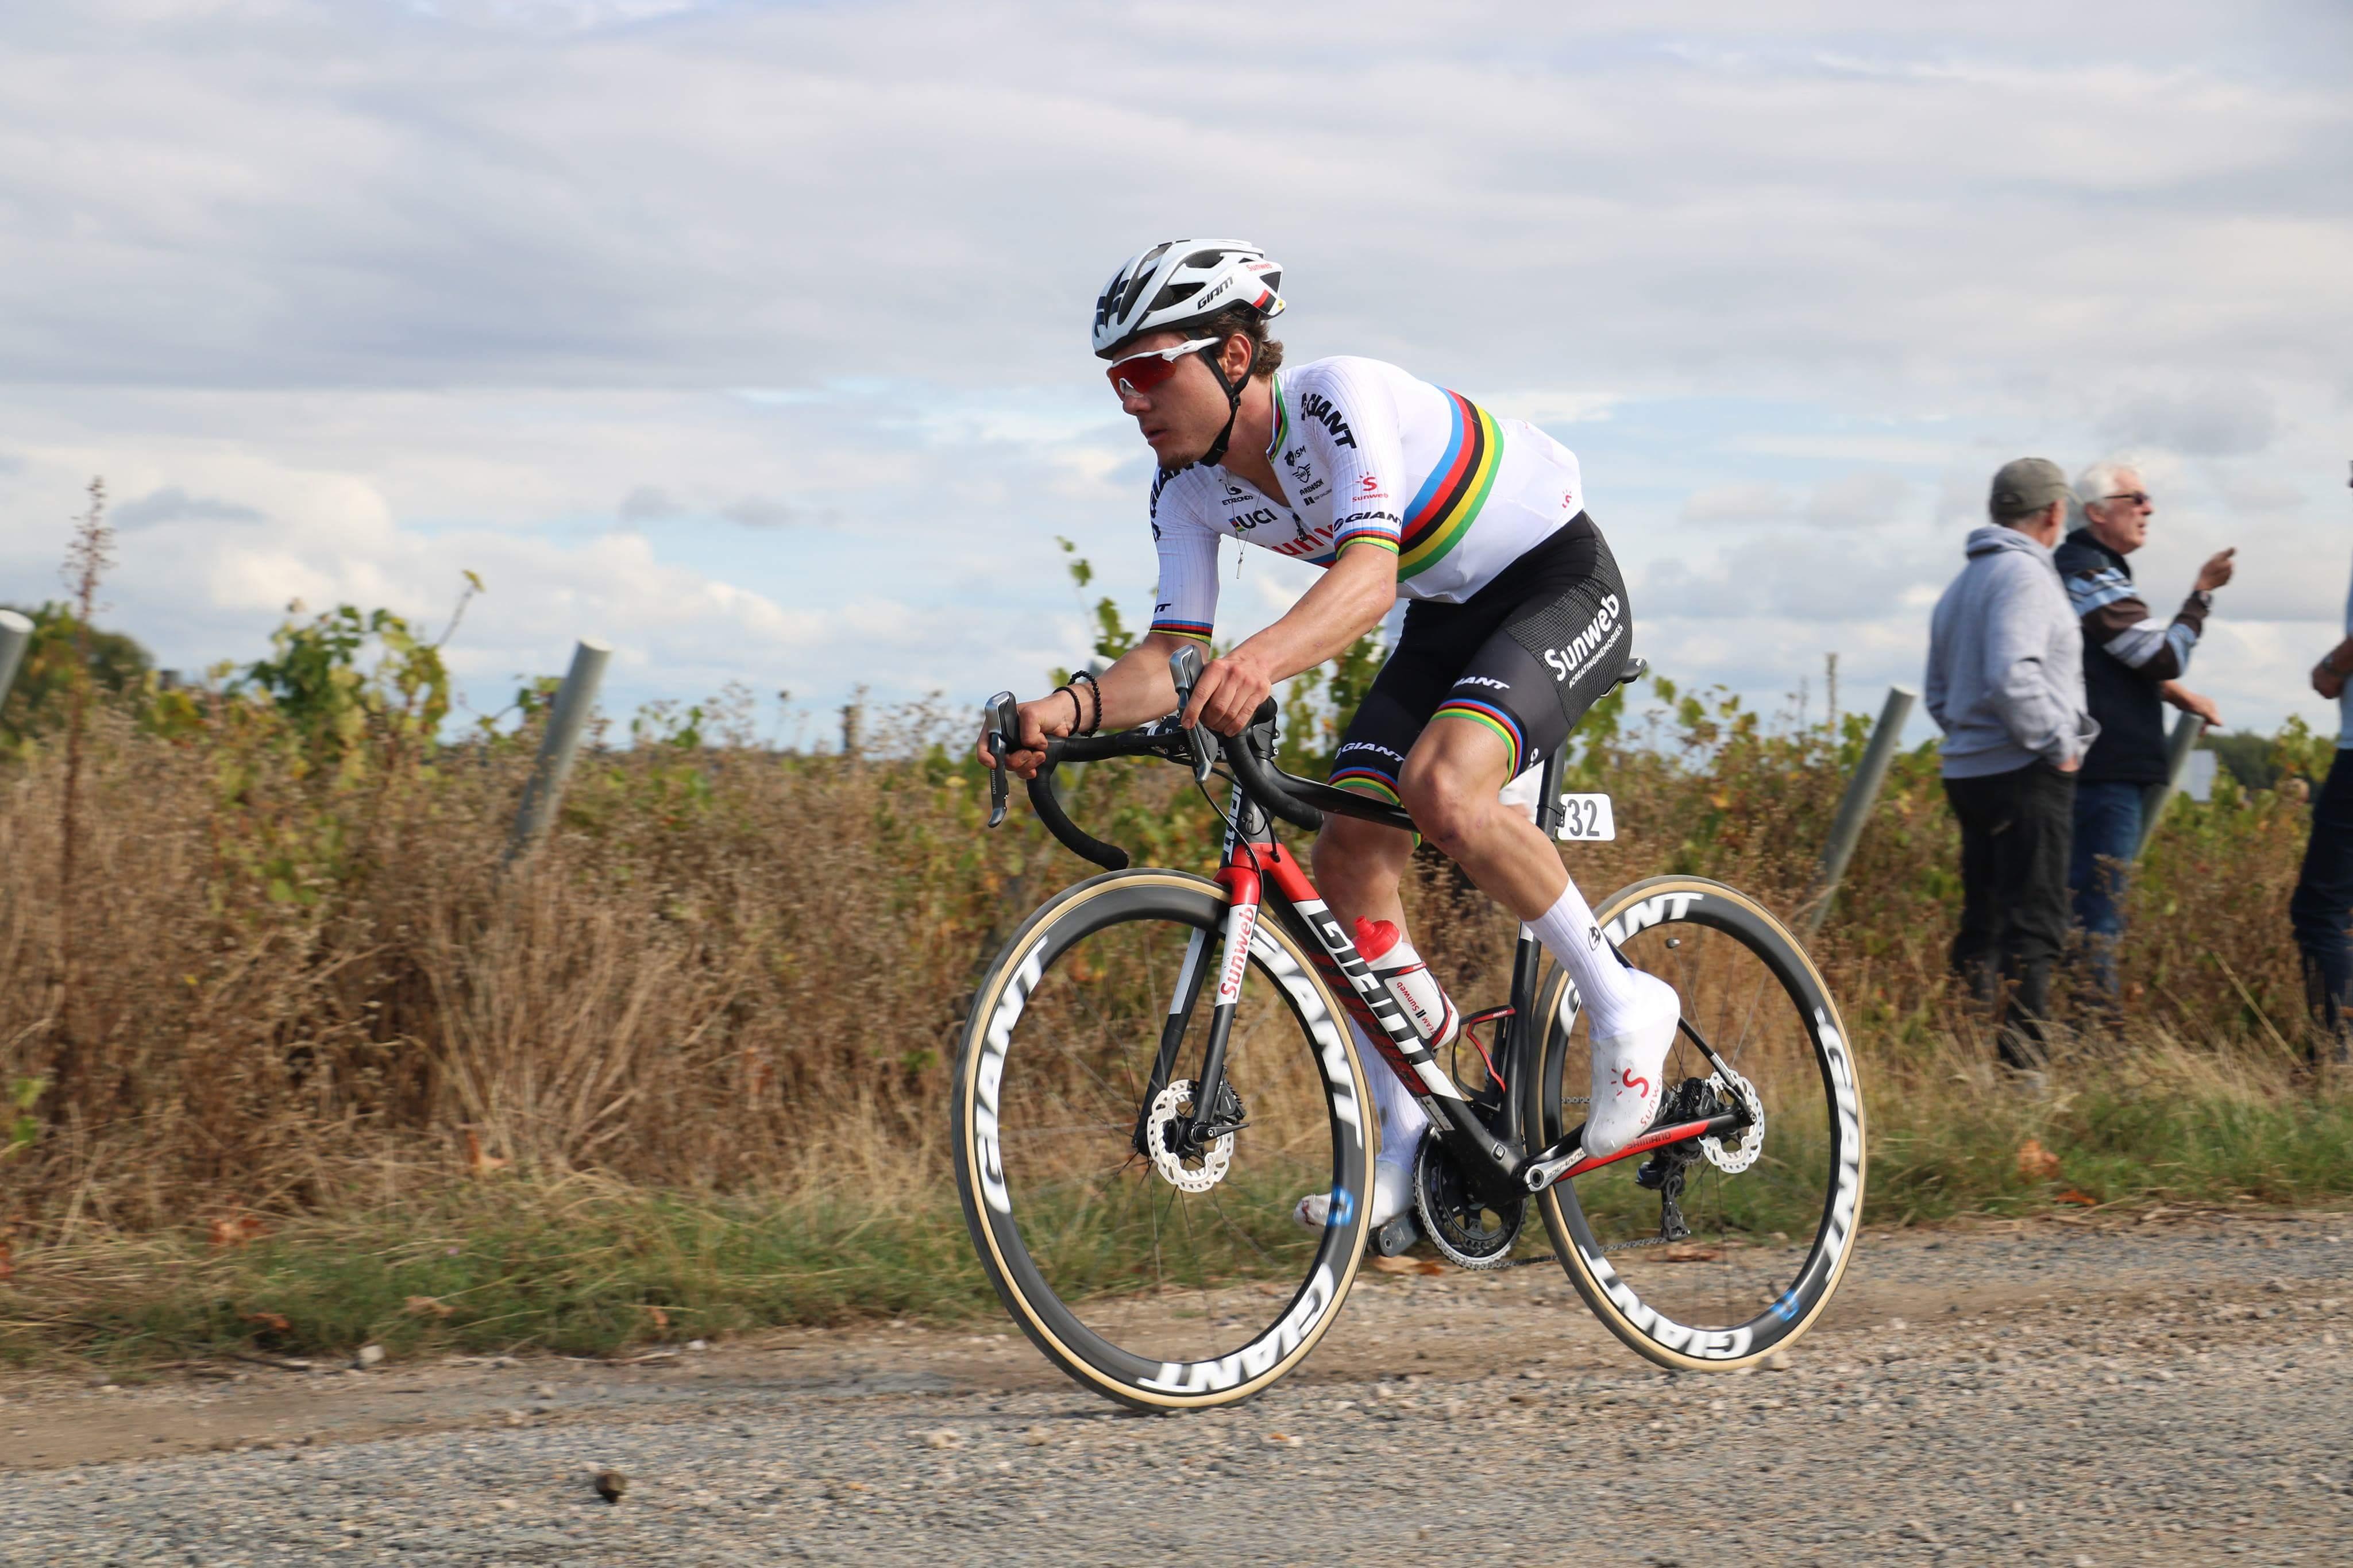 Marc Hirschi U23 World Champion Team Giant Sunweb